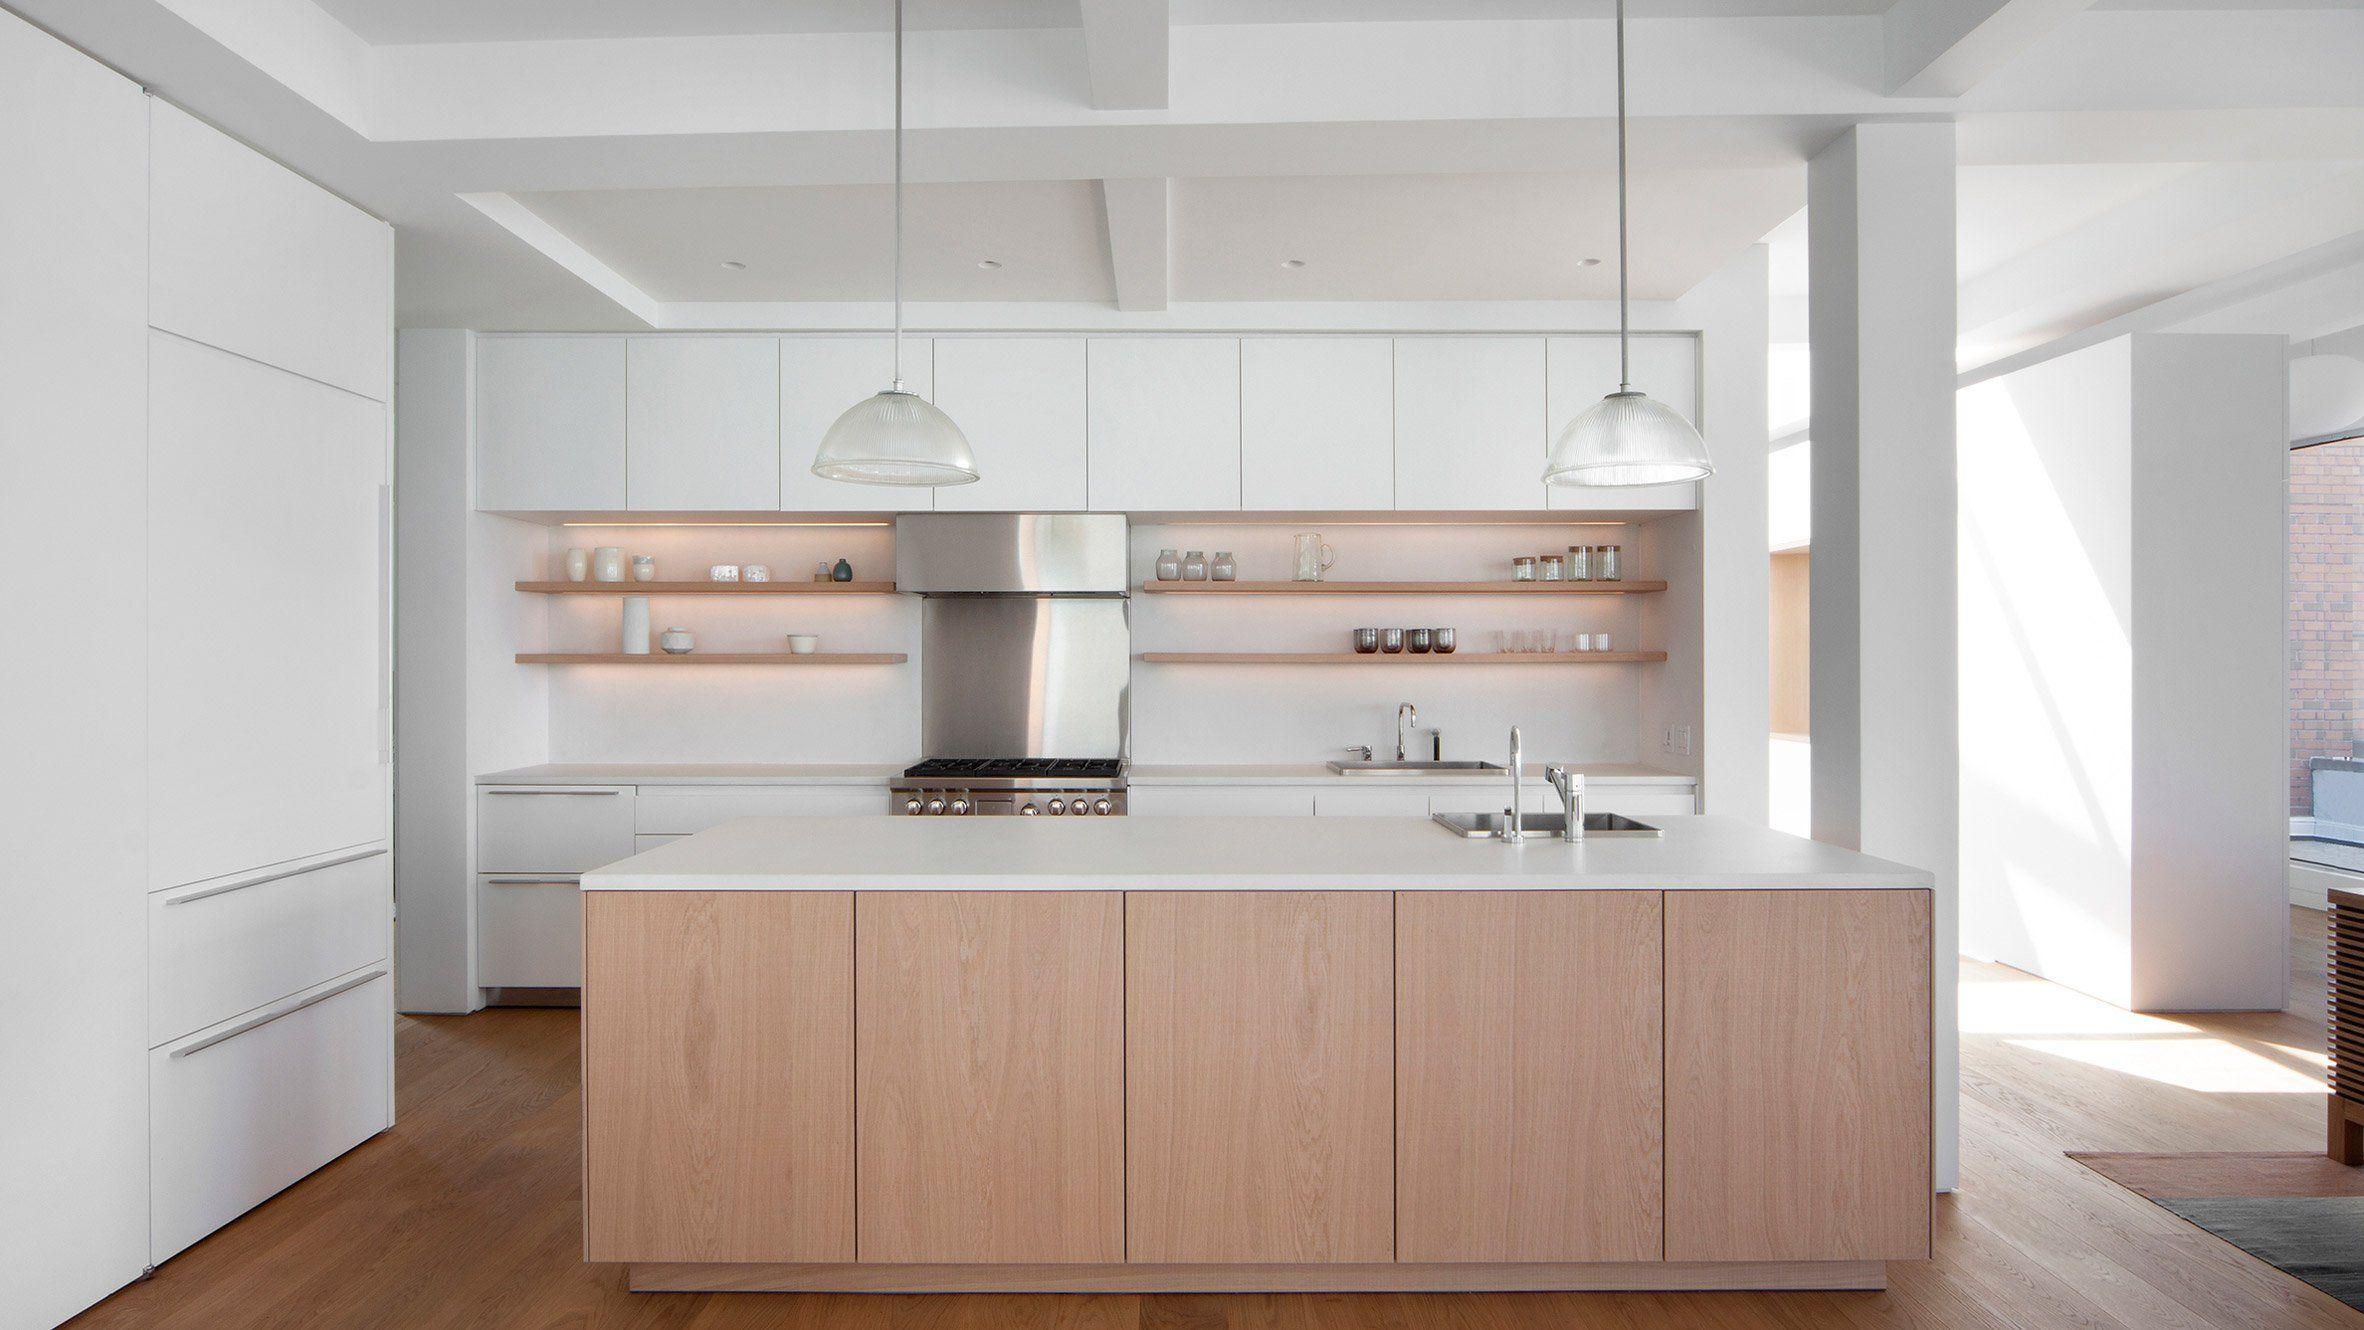 Duplex in Tribeca by Space4Architecture | Interior | Pinterest ...